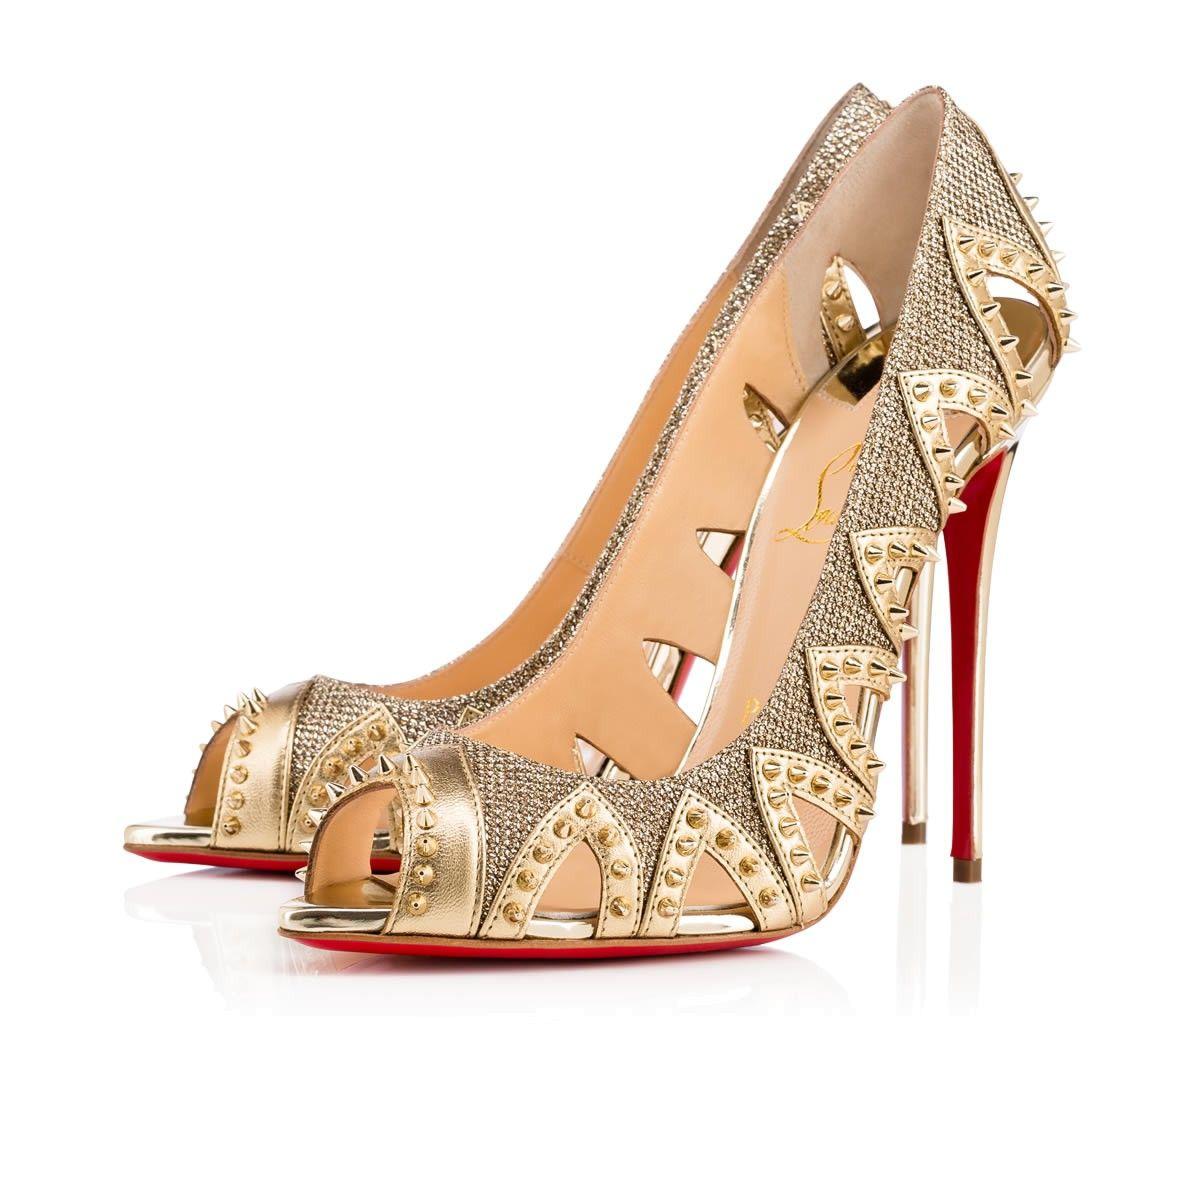 new product c5ba6 effcf Christian louboutin circus city - glitter gold,christian ...